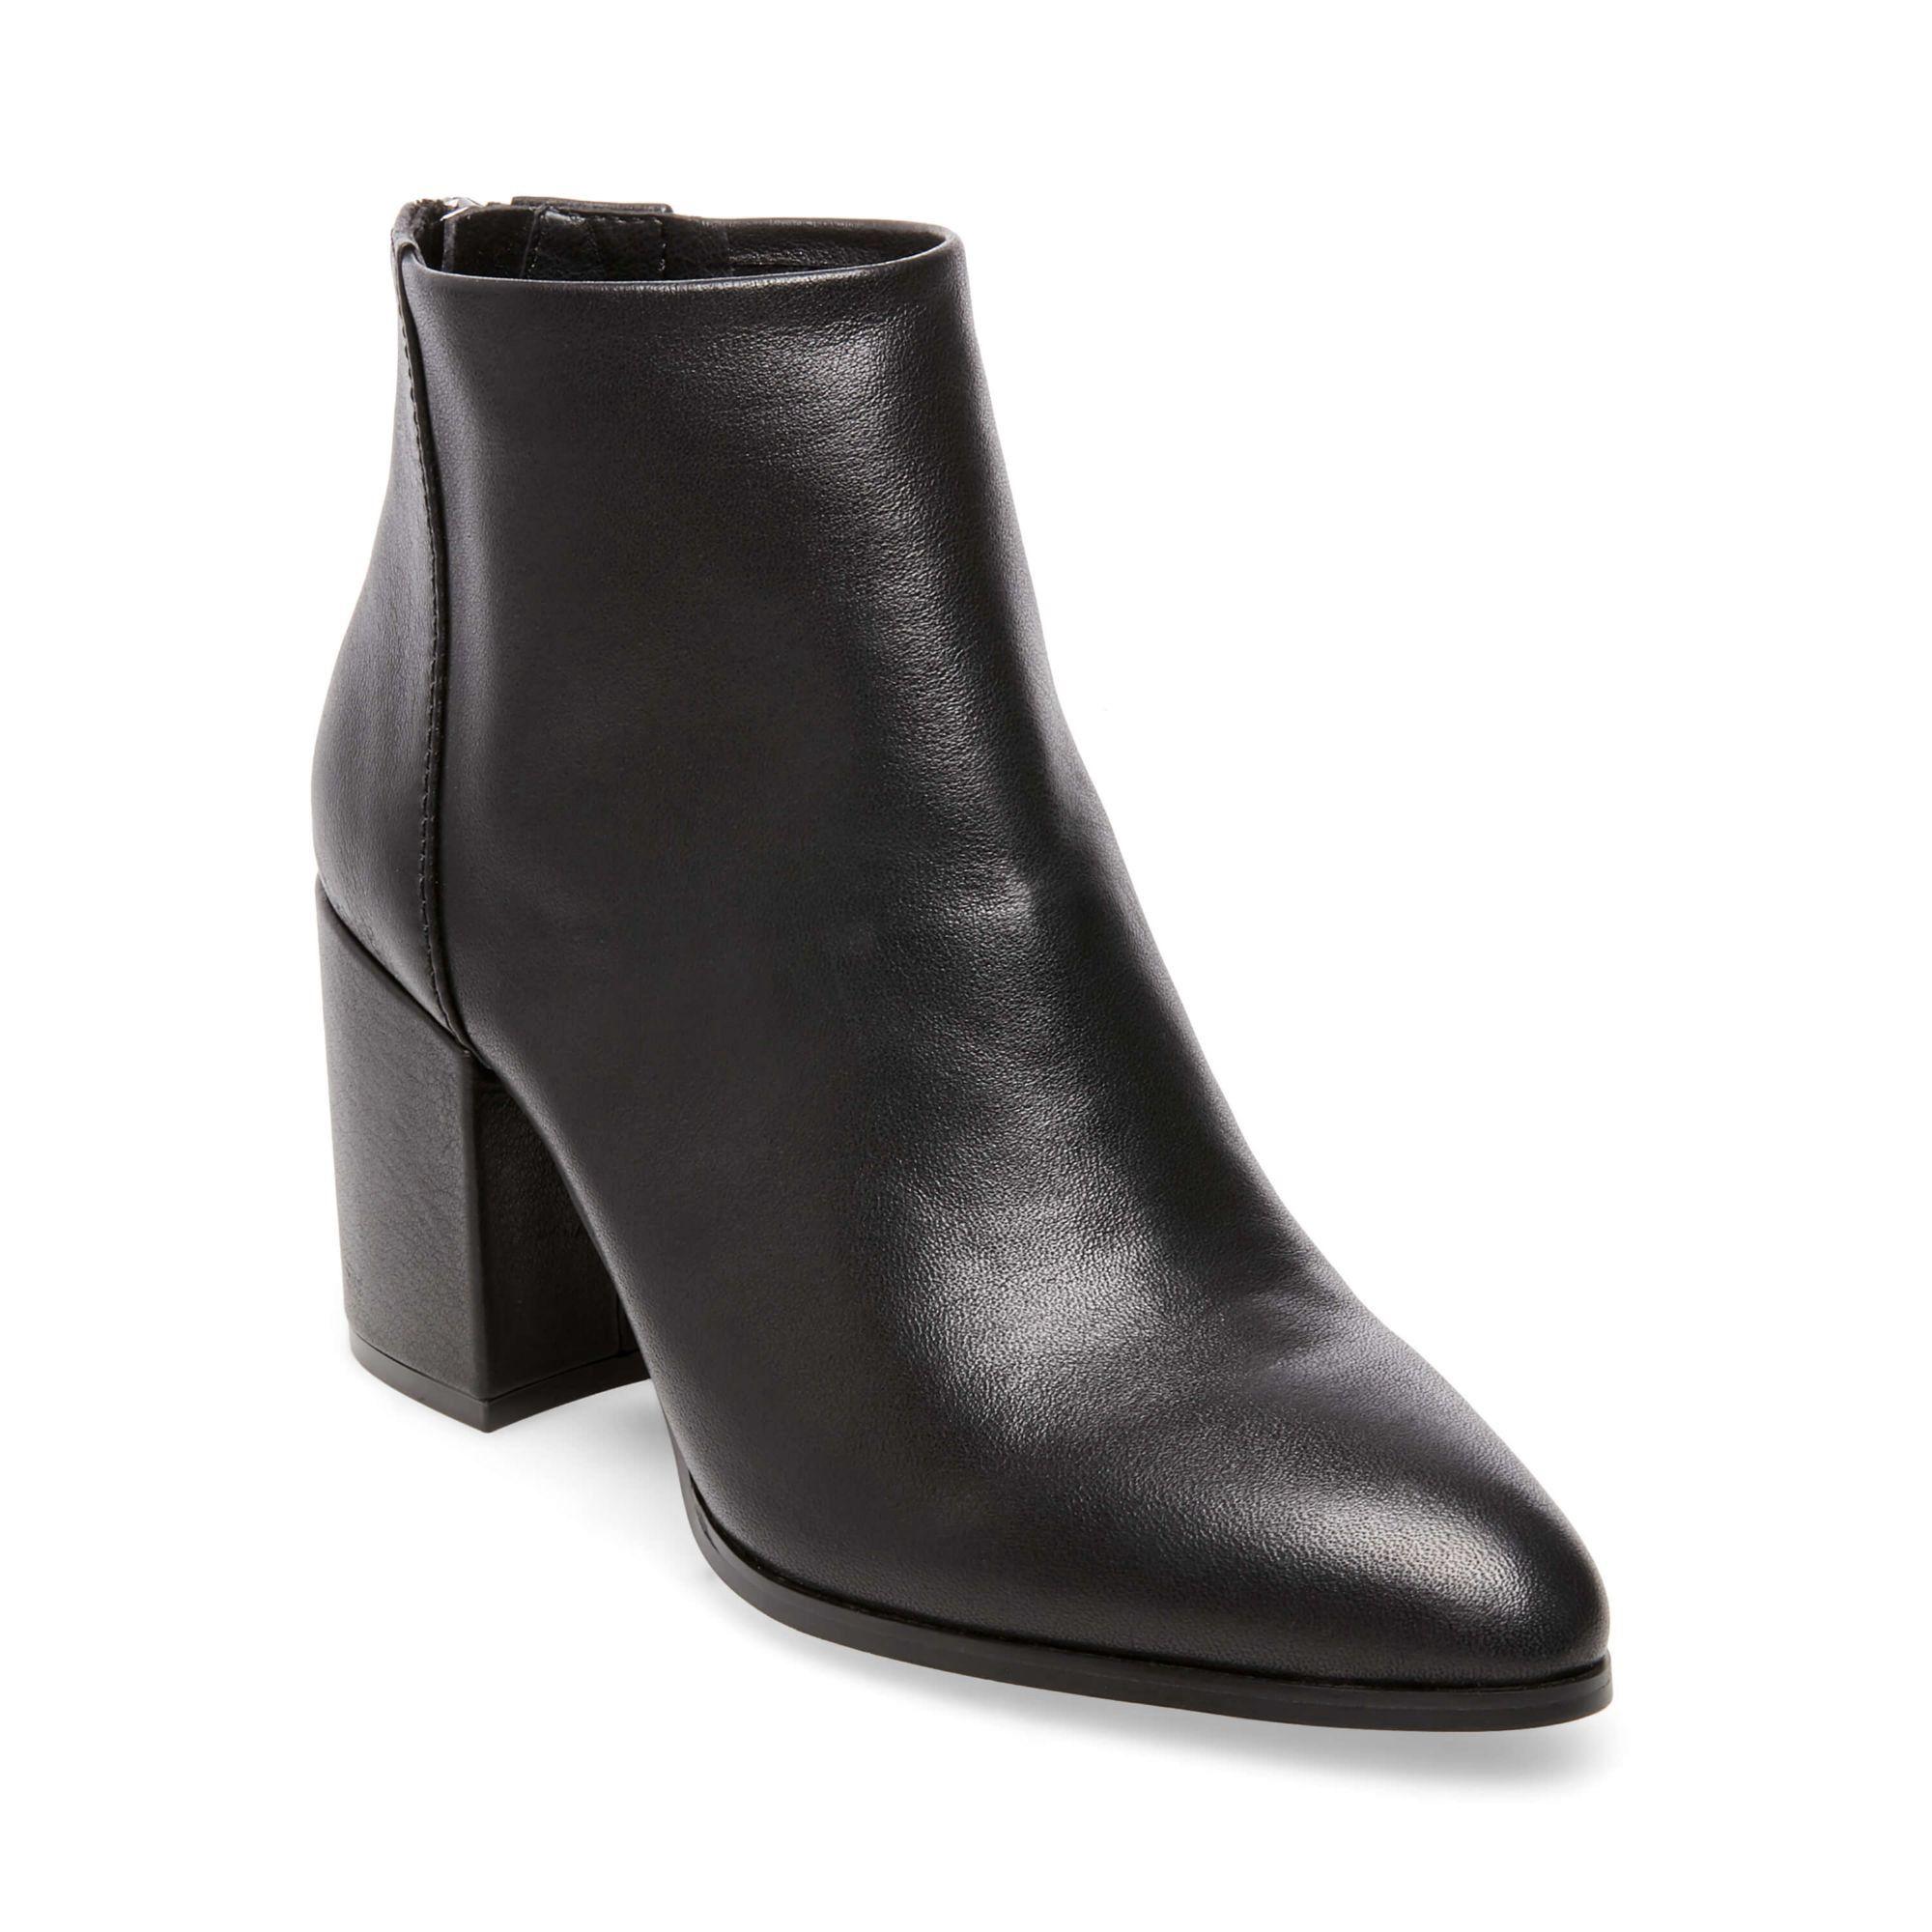 de6d3d64139 Steve Madden Jillian - Black Leather 9.5